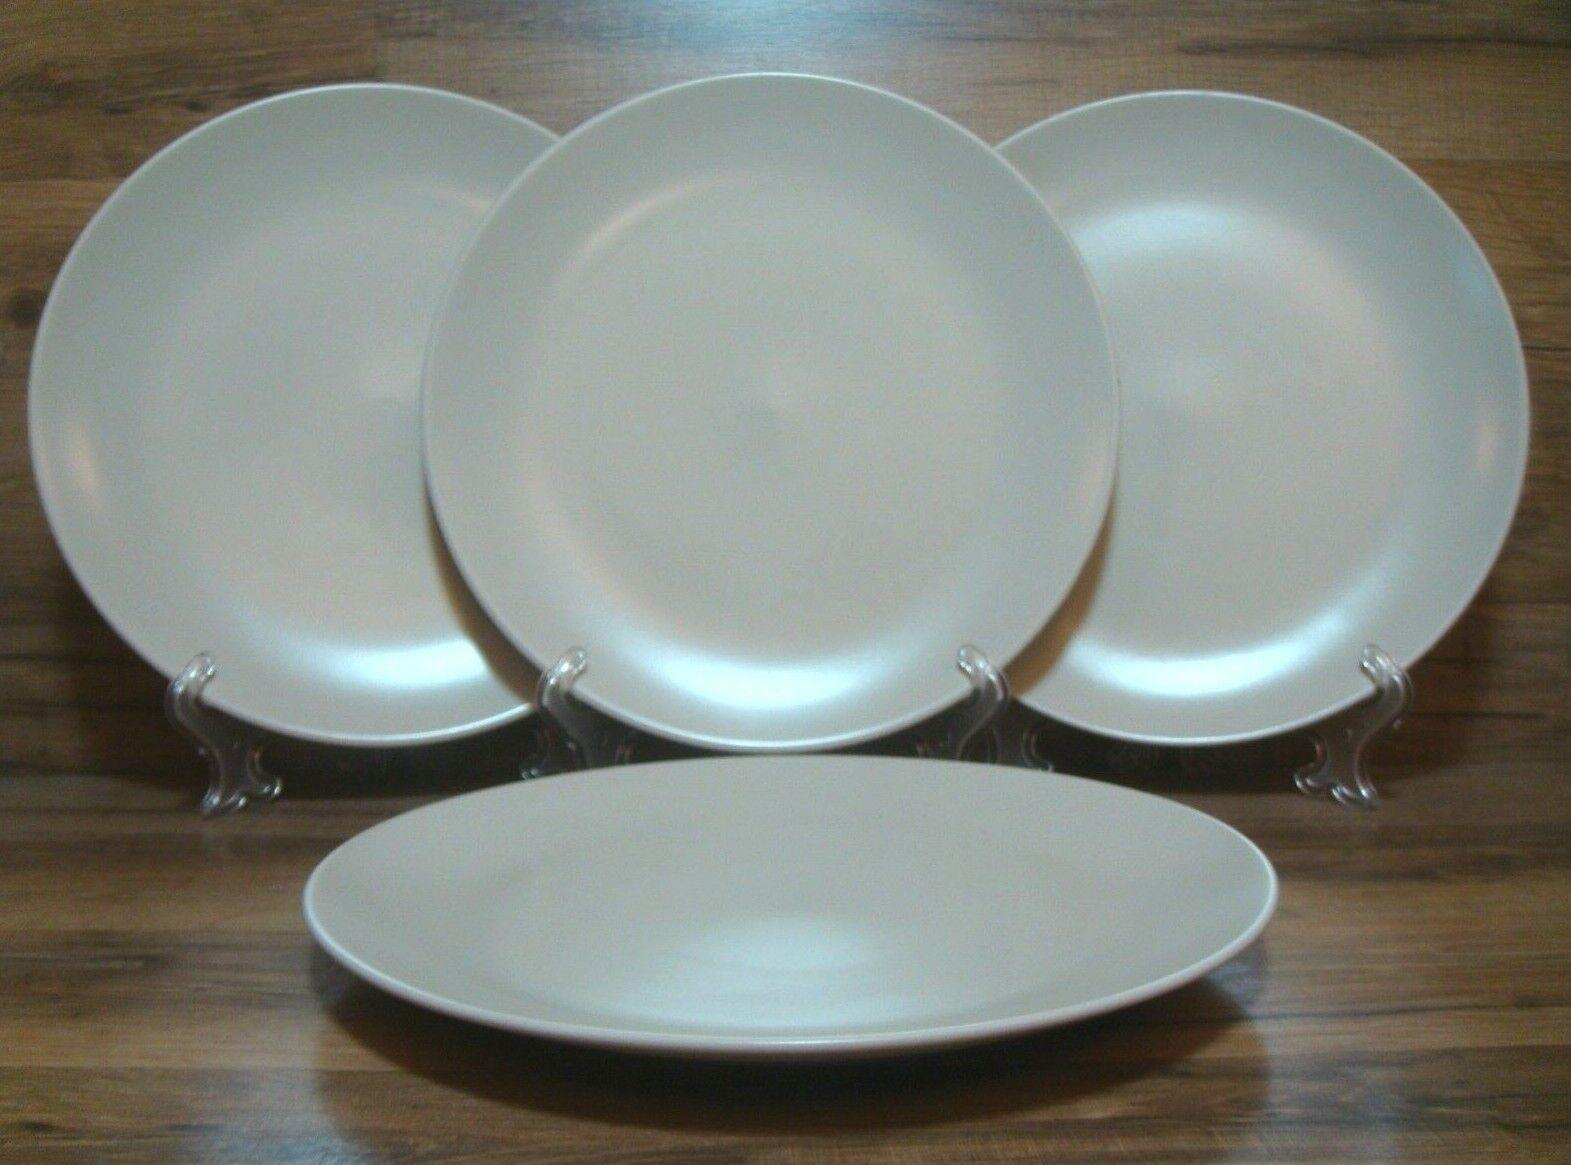 Set Of 4 Ikea Dinera Matte Beige 10 1 4 Dinner Plates Euc 10866 Ln For Sale Online